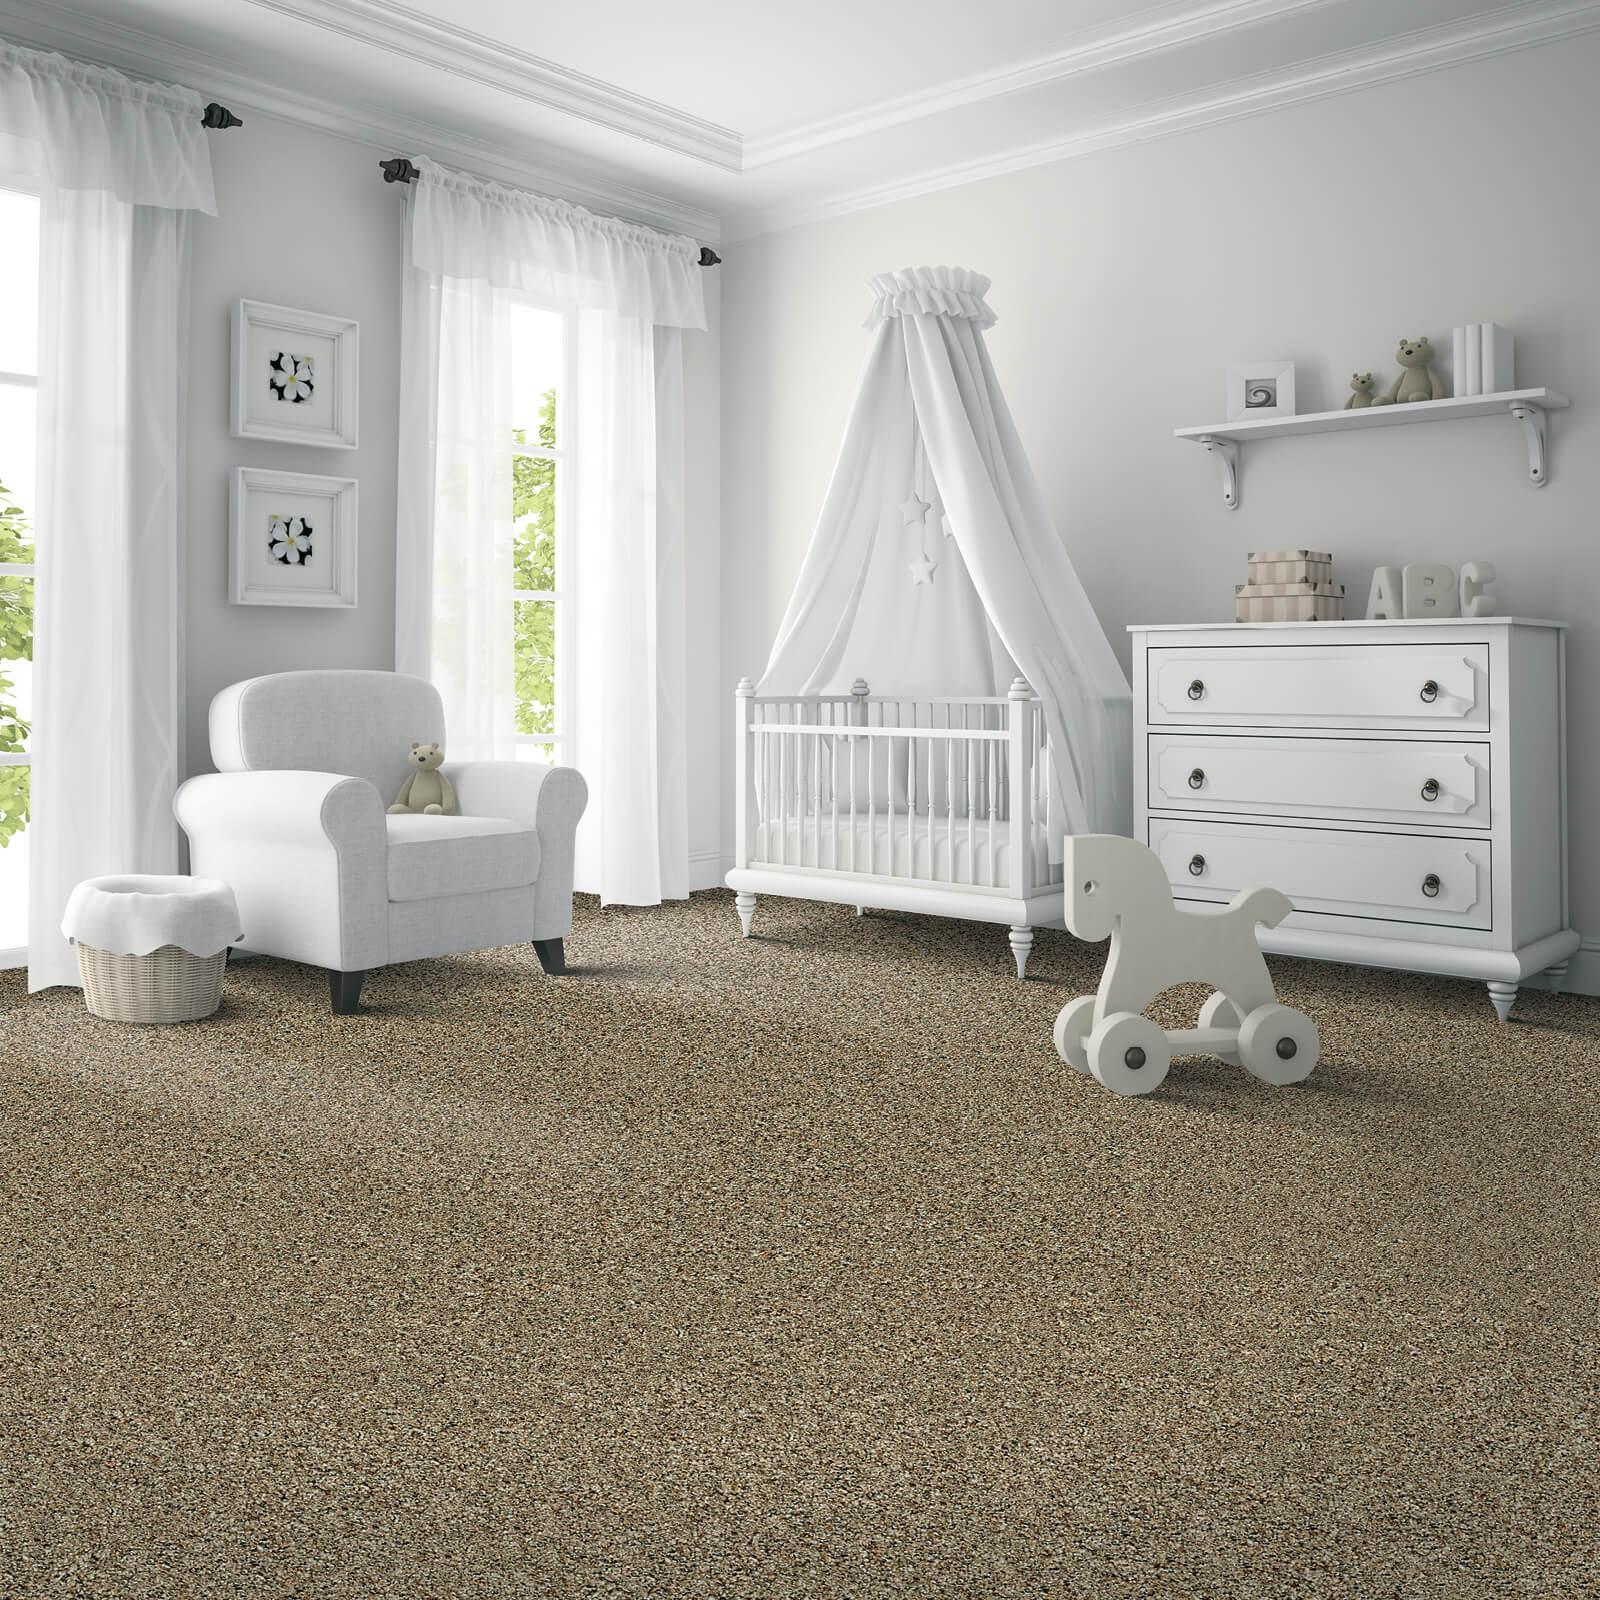 Grey Carpet of baby room | McSwain Carpet & Floors